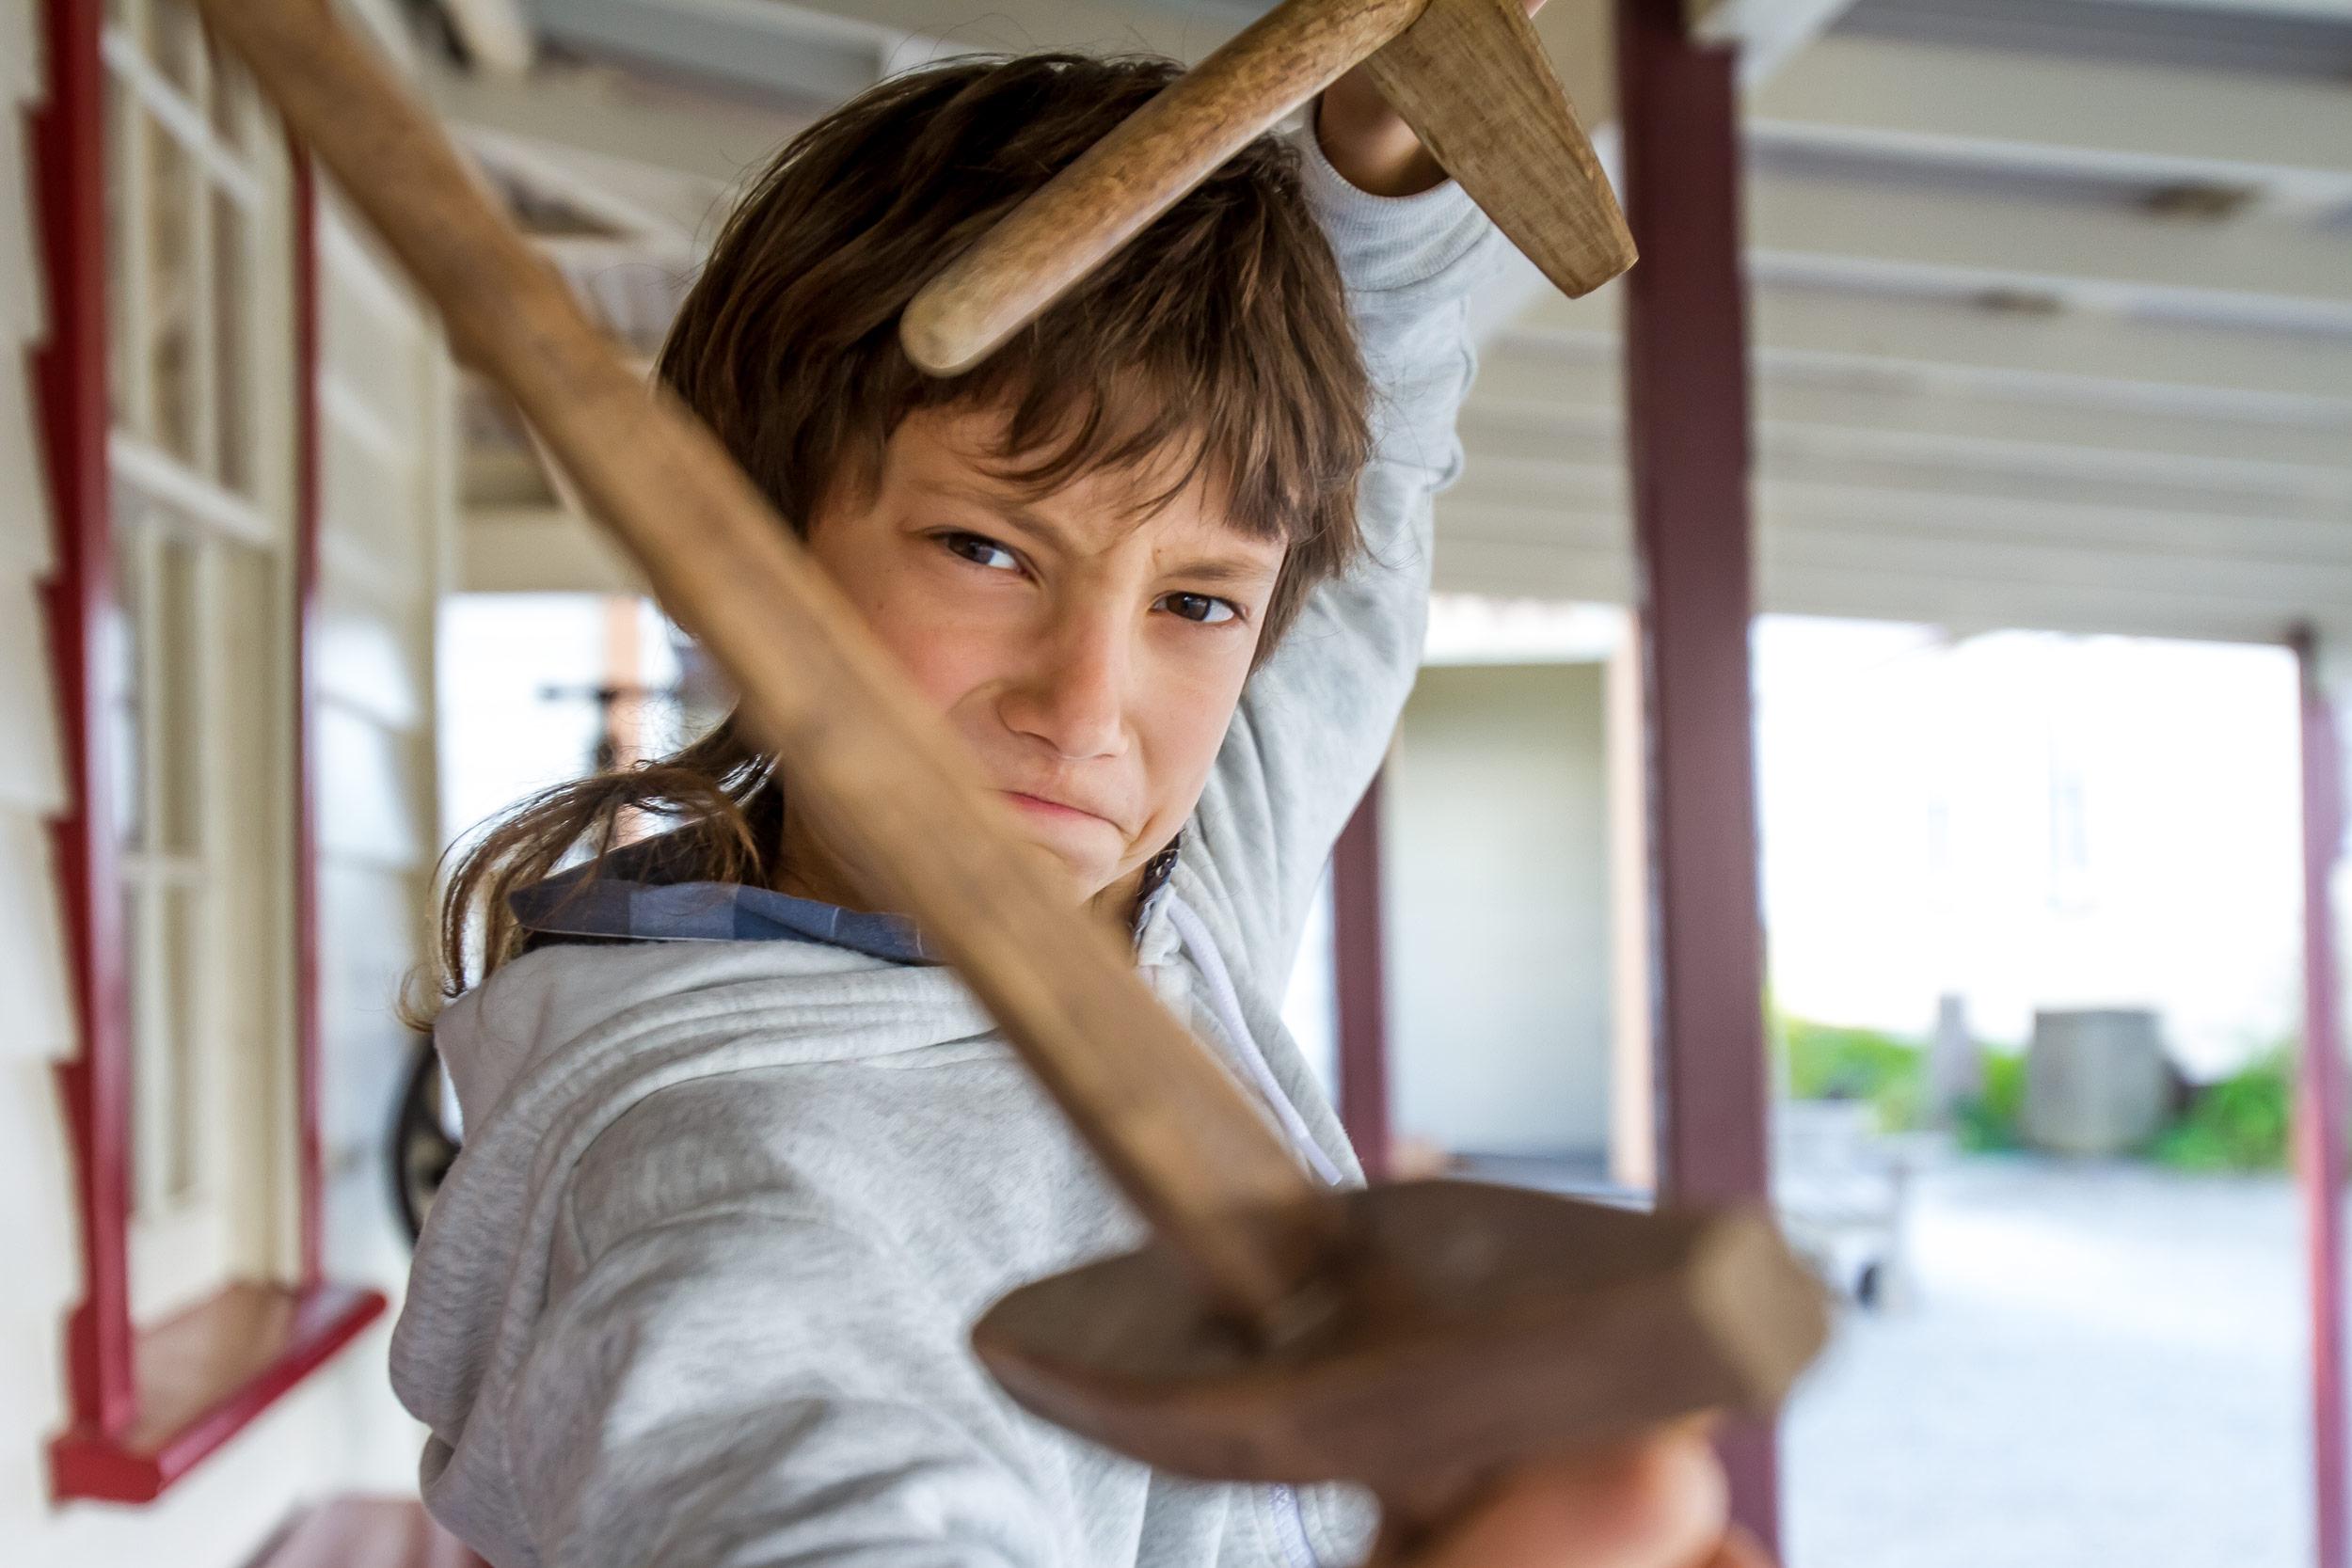 outdoor portrait of a child boy